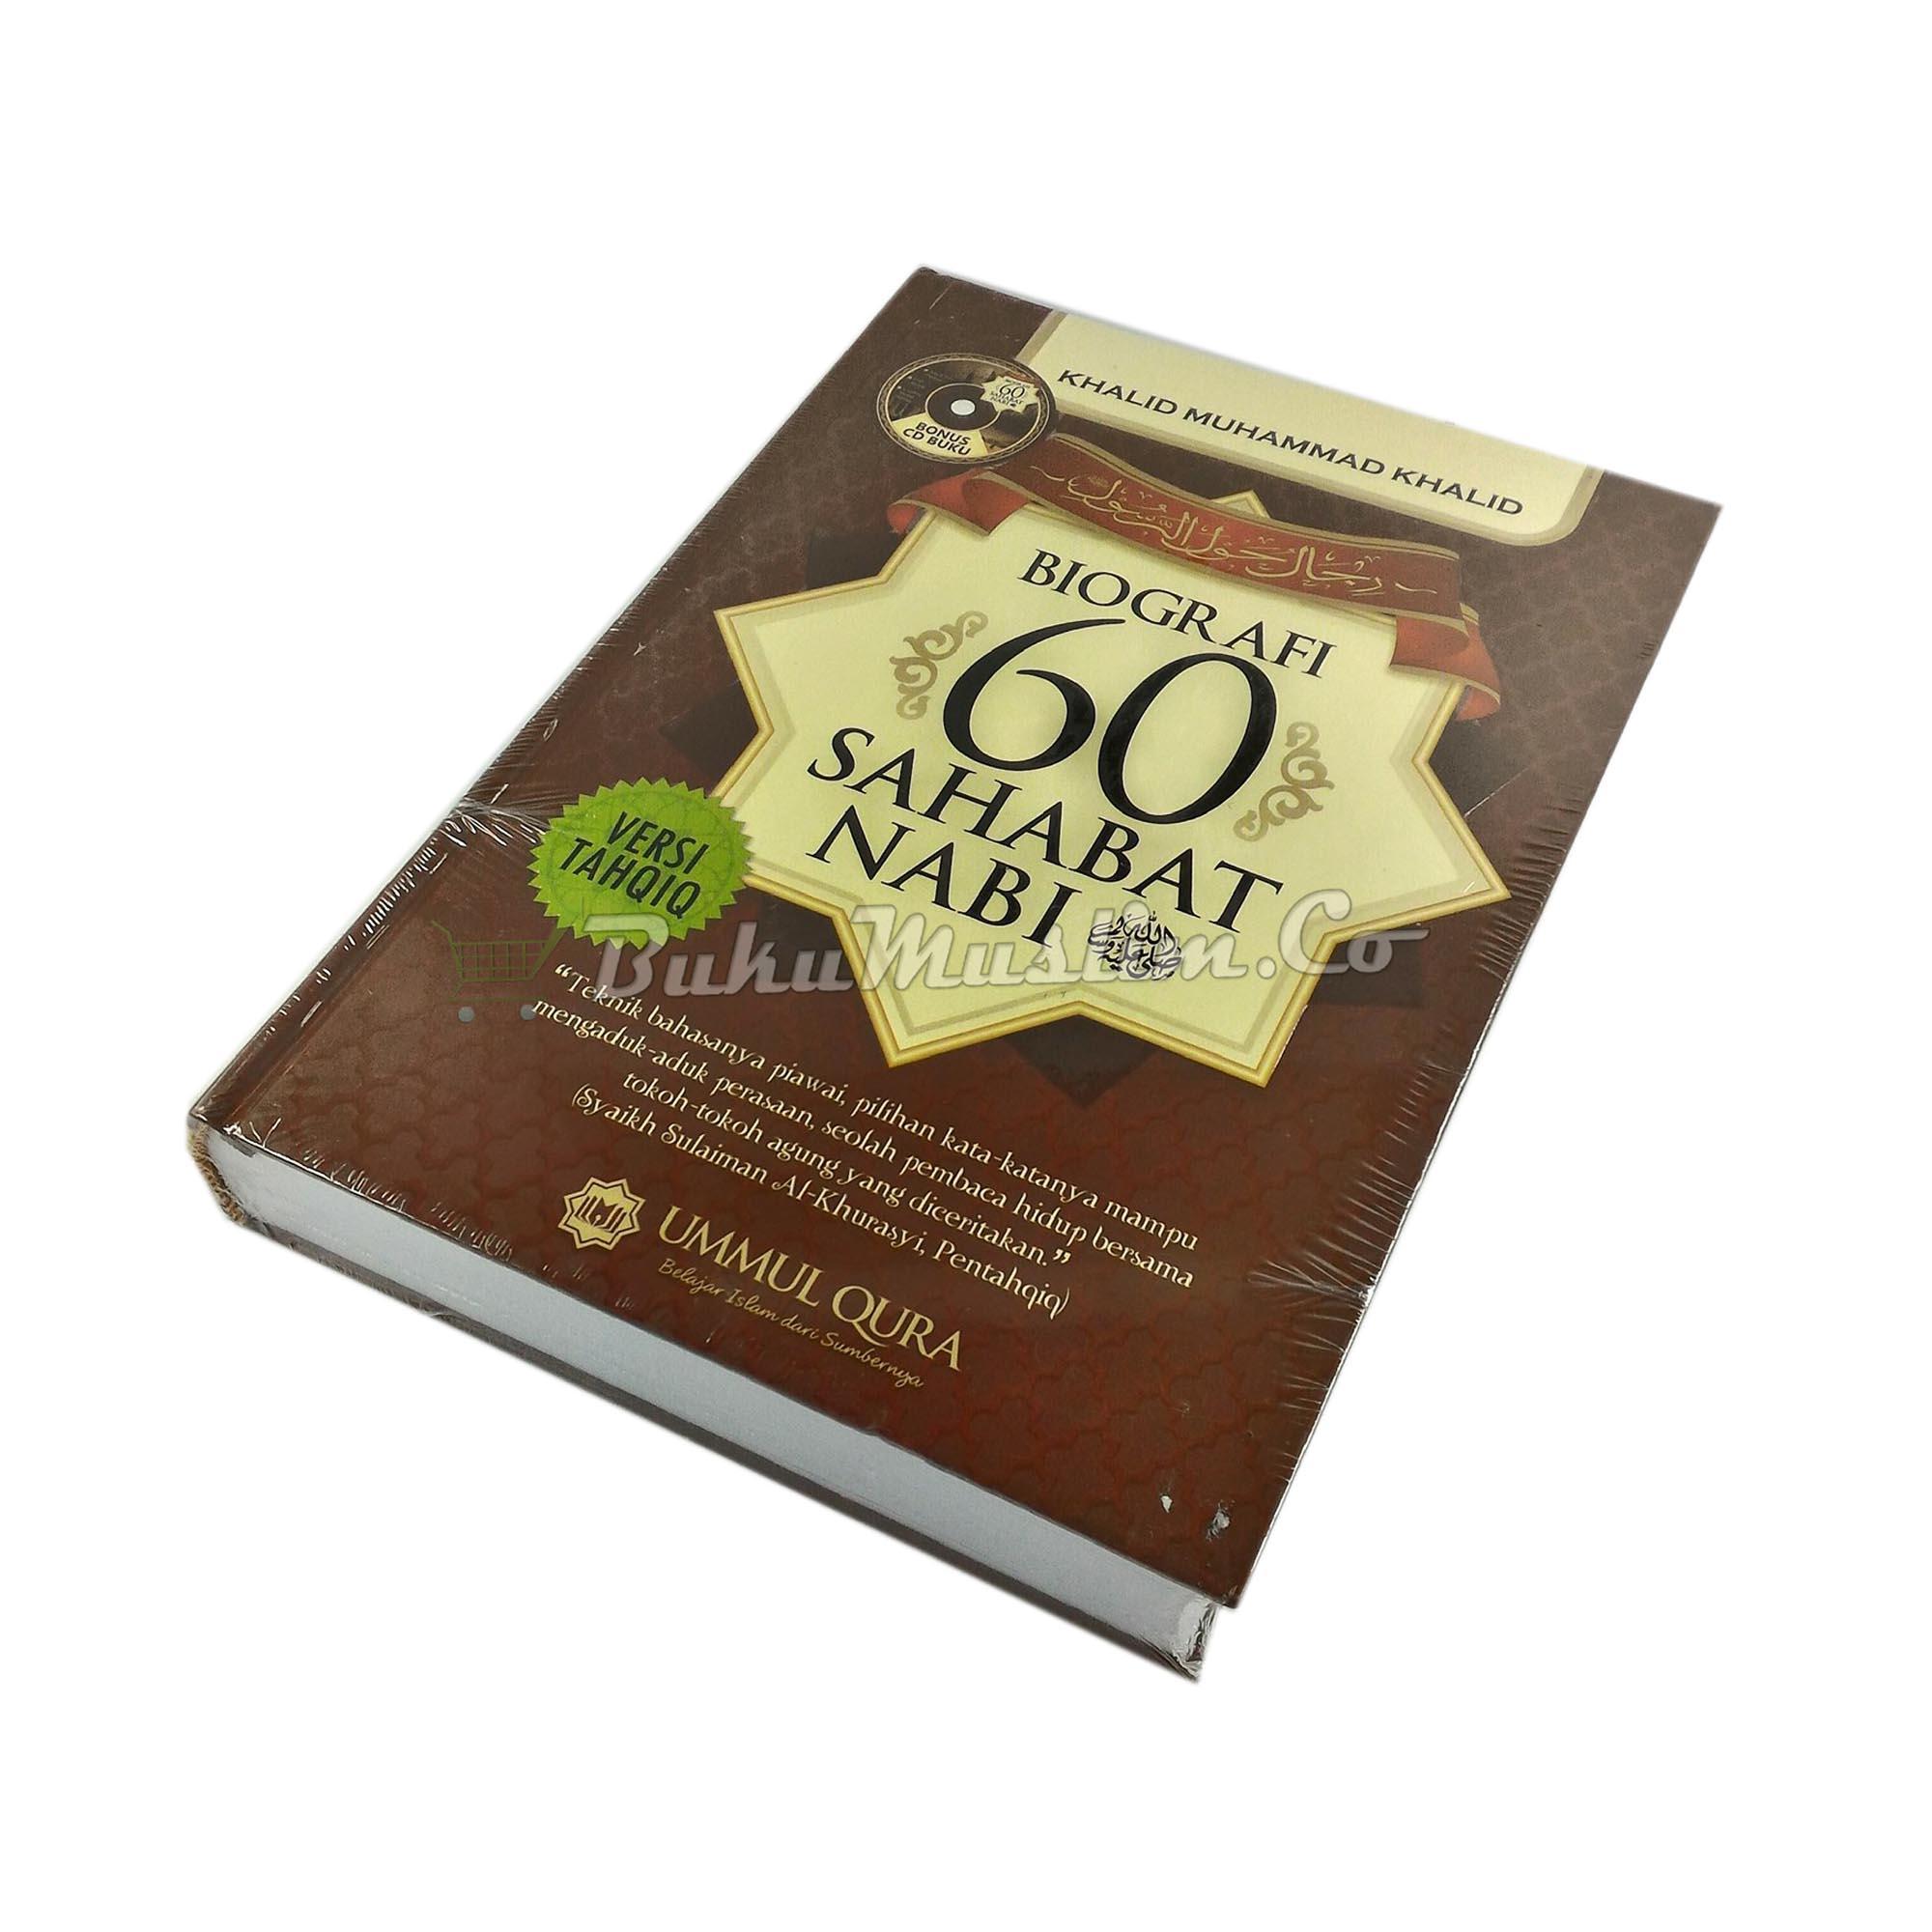 Buku Biografi 60 Sahabat Nabi - BukuMuslim.co